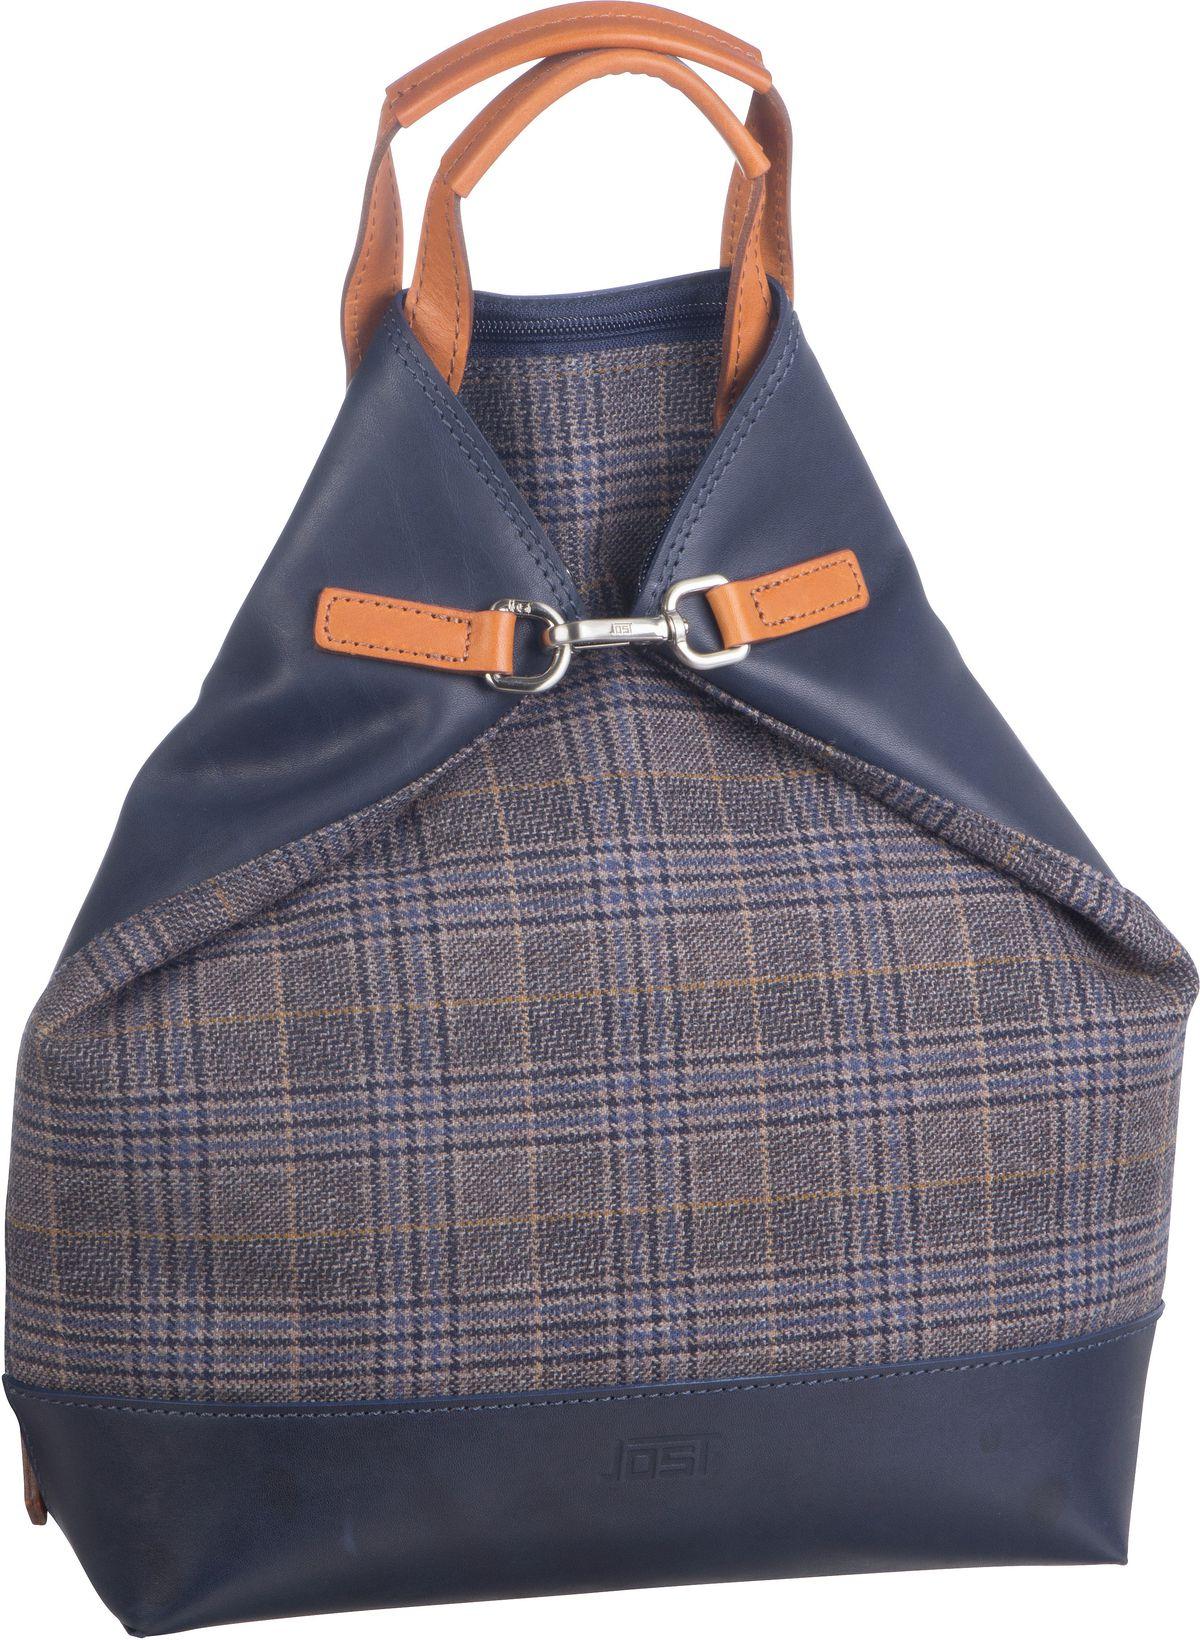 Rucksack / Daypack Checks 7234 X-Change Bag XS Grey